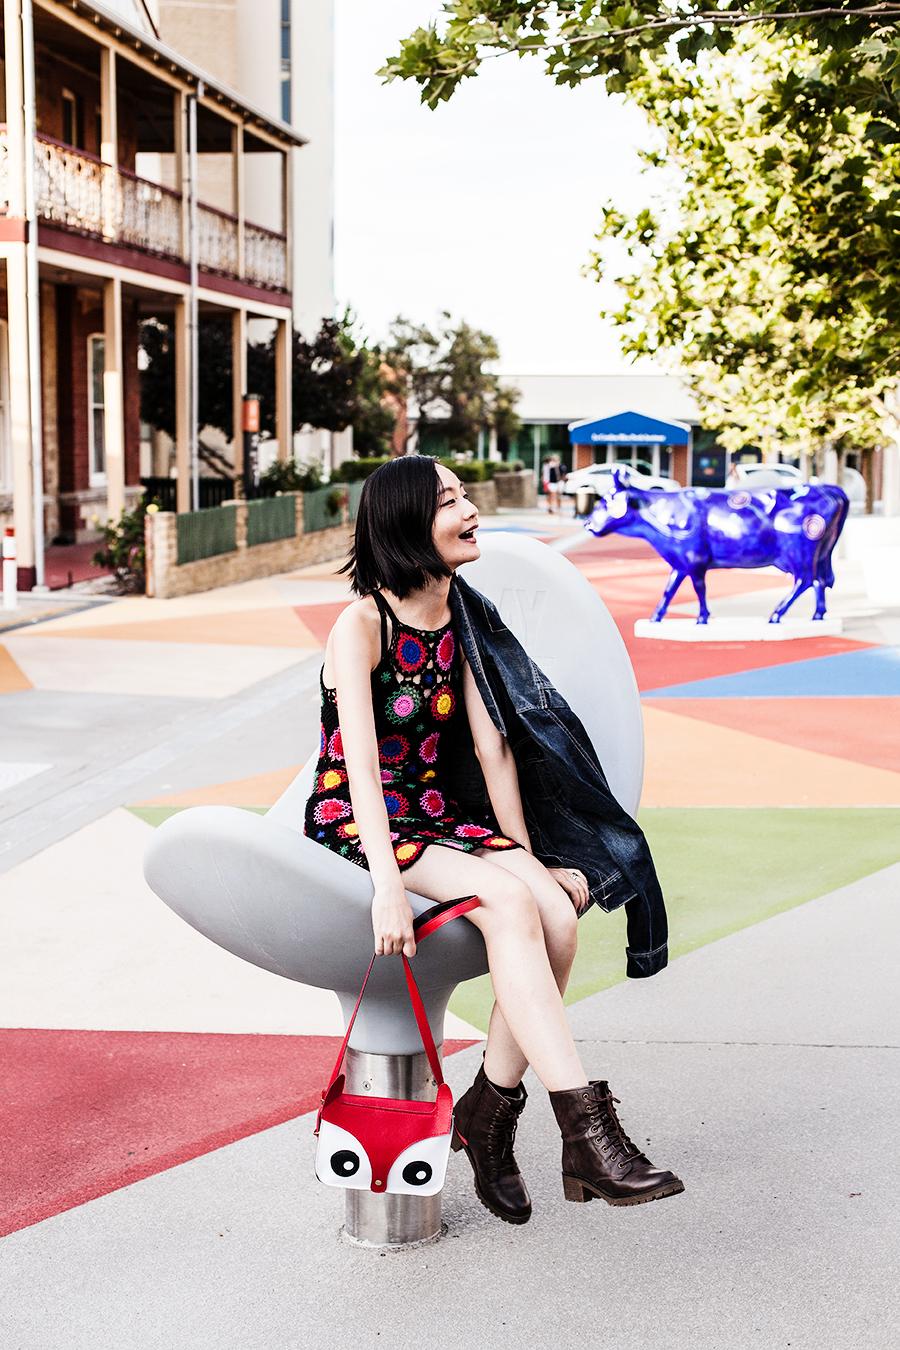 Crochet outfit: H&M Coachella inspired crochet dress, Matryoshka earrings, Blend denim jacket, fox bag, Steve Madden boots.